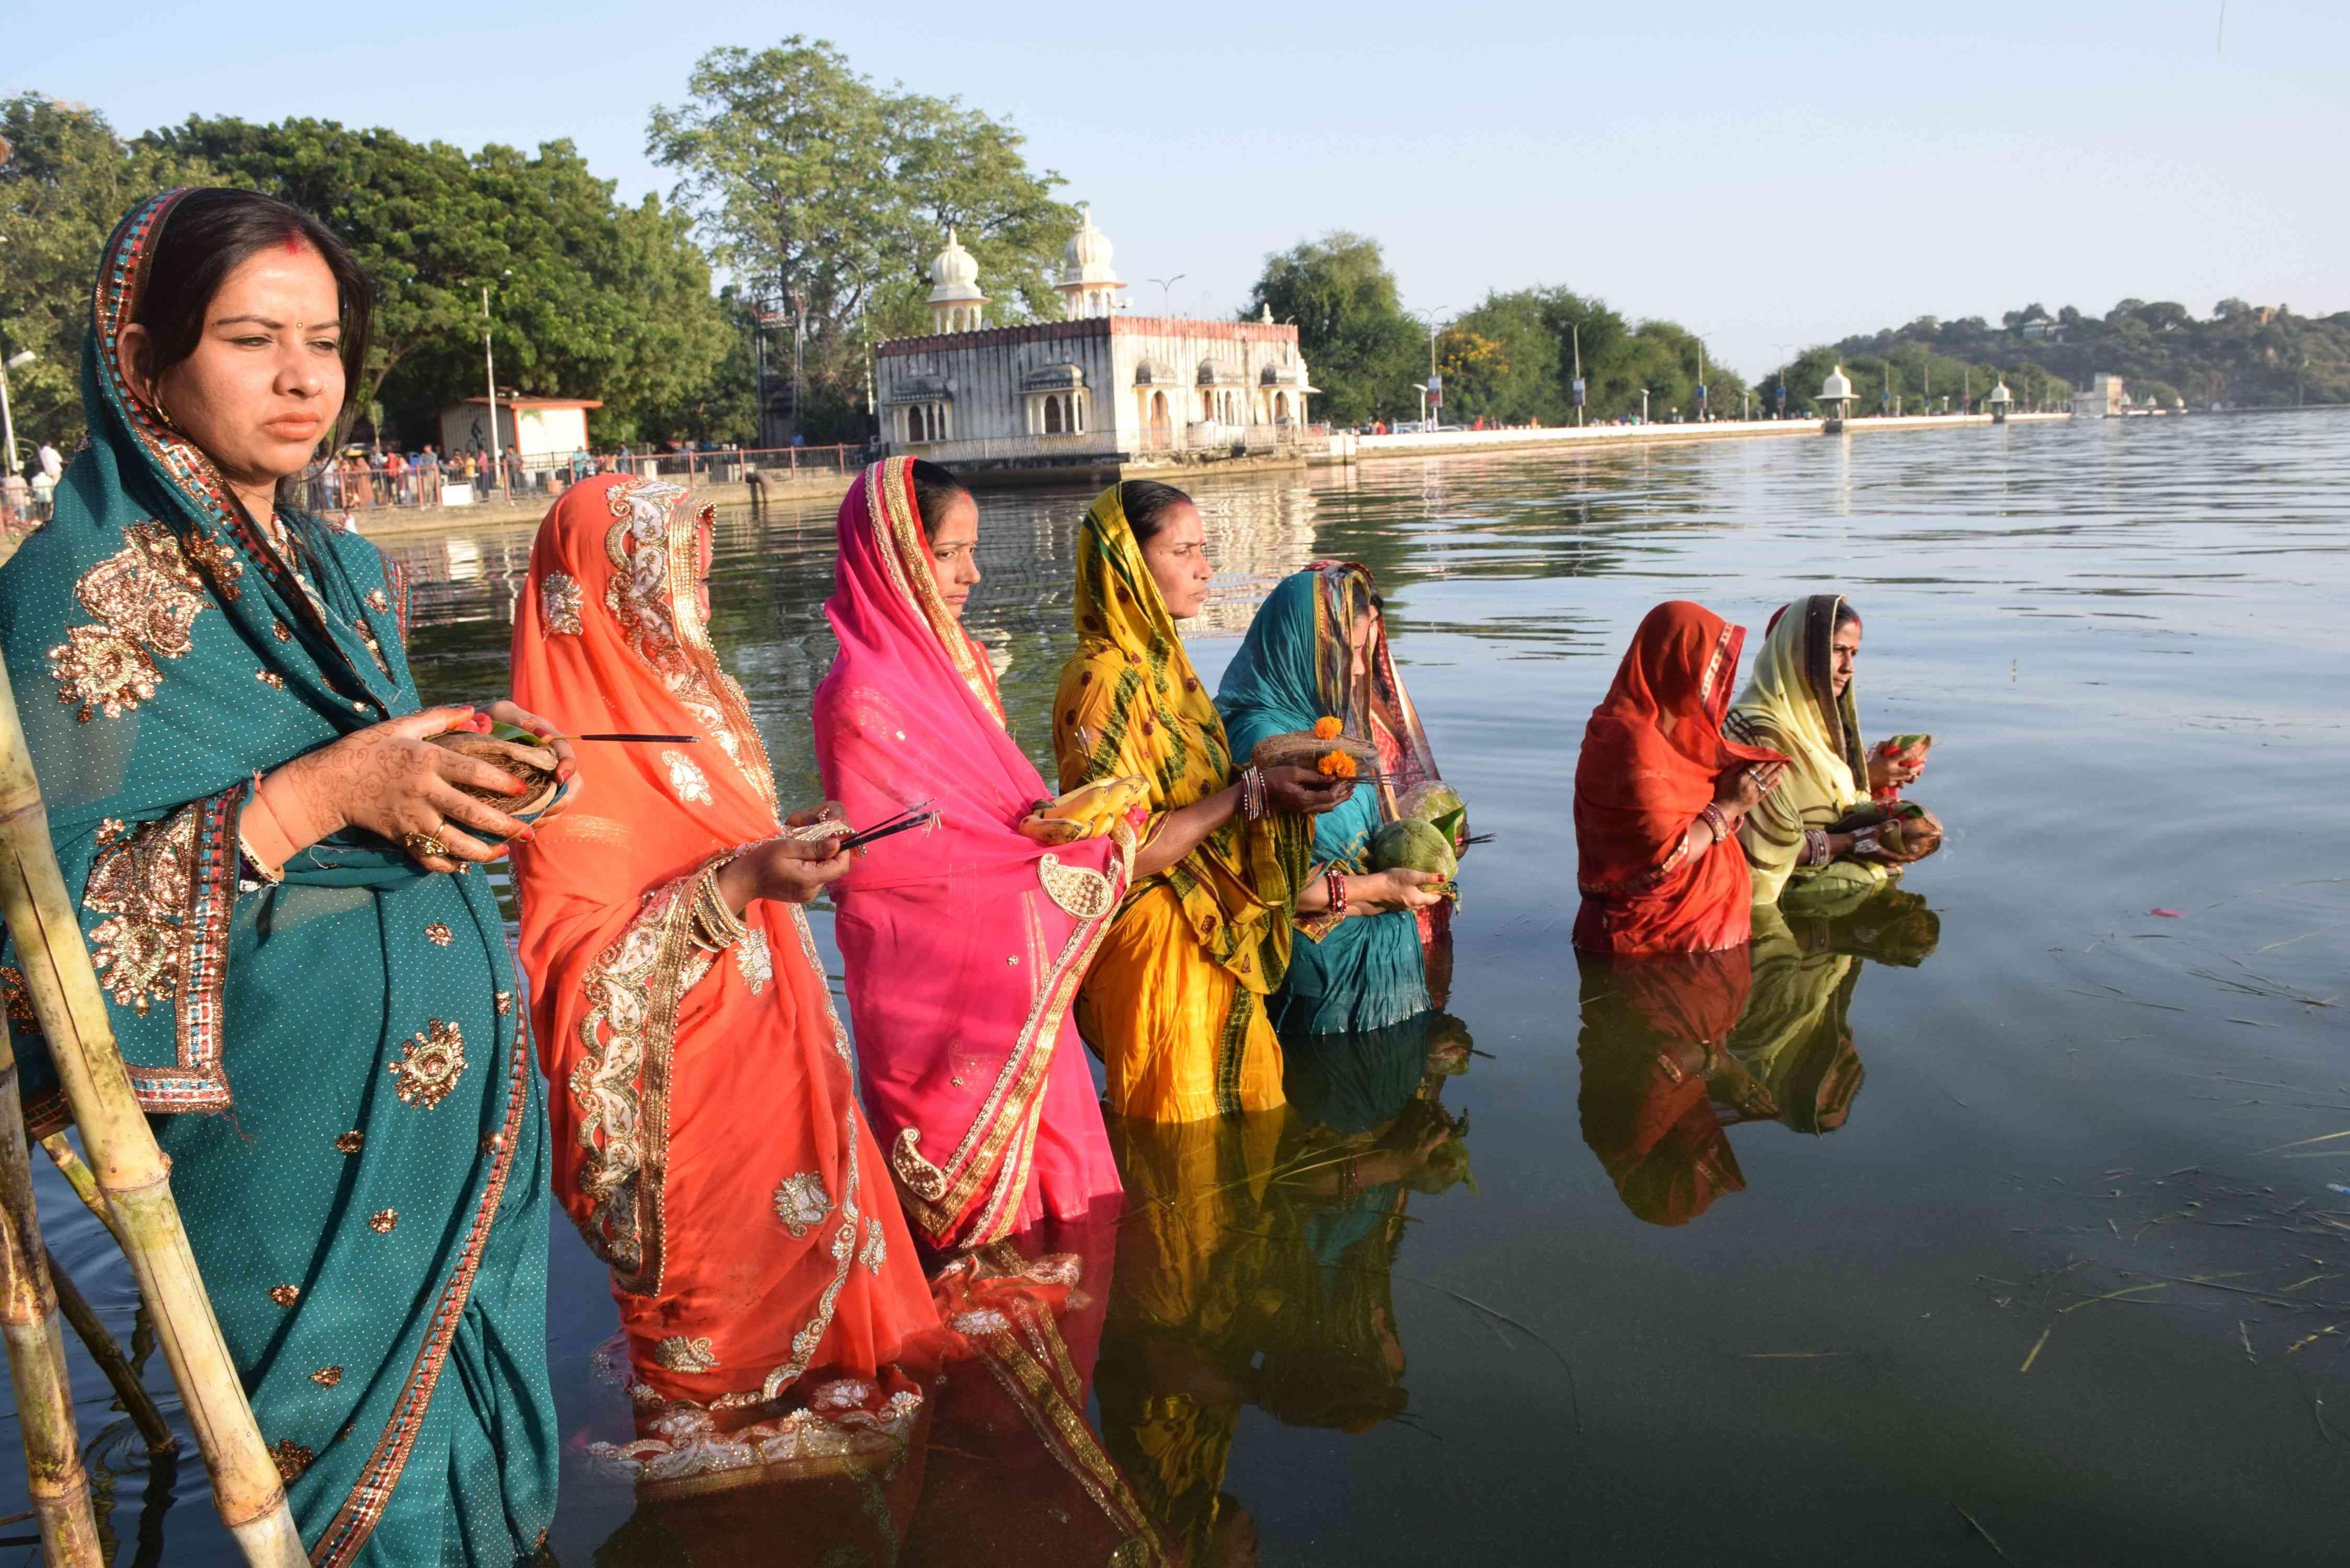 картинки про индию религия сомневаемся